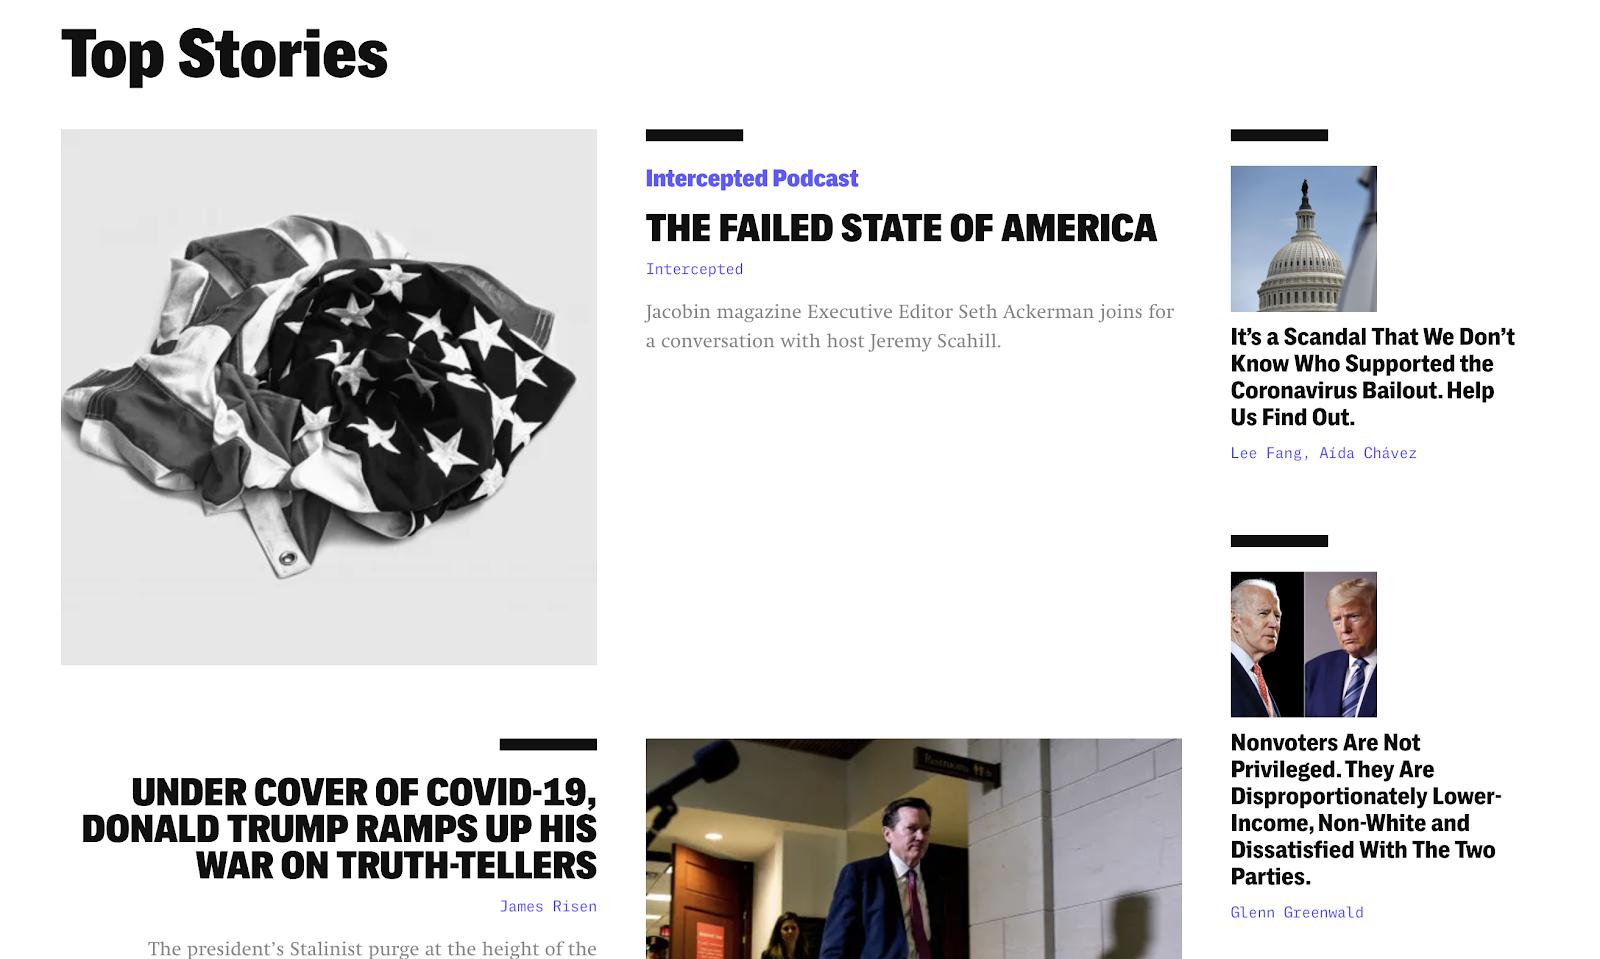 The Intercept Screenshot of Top Stories